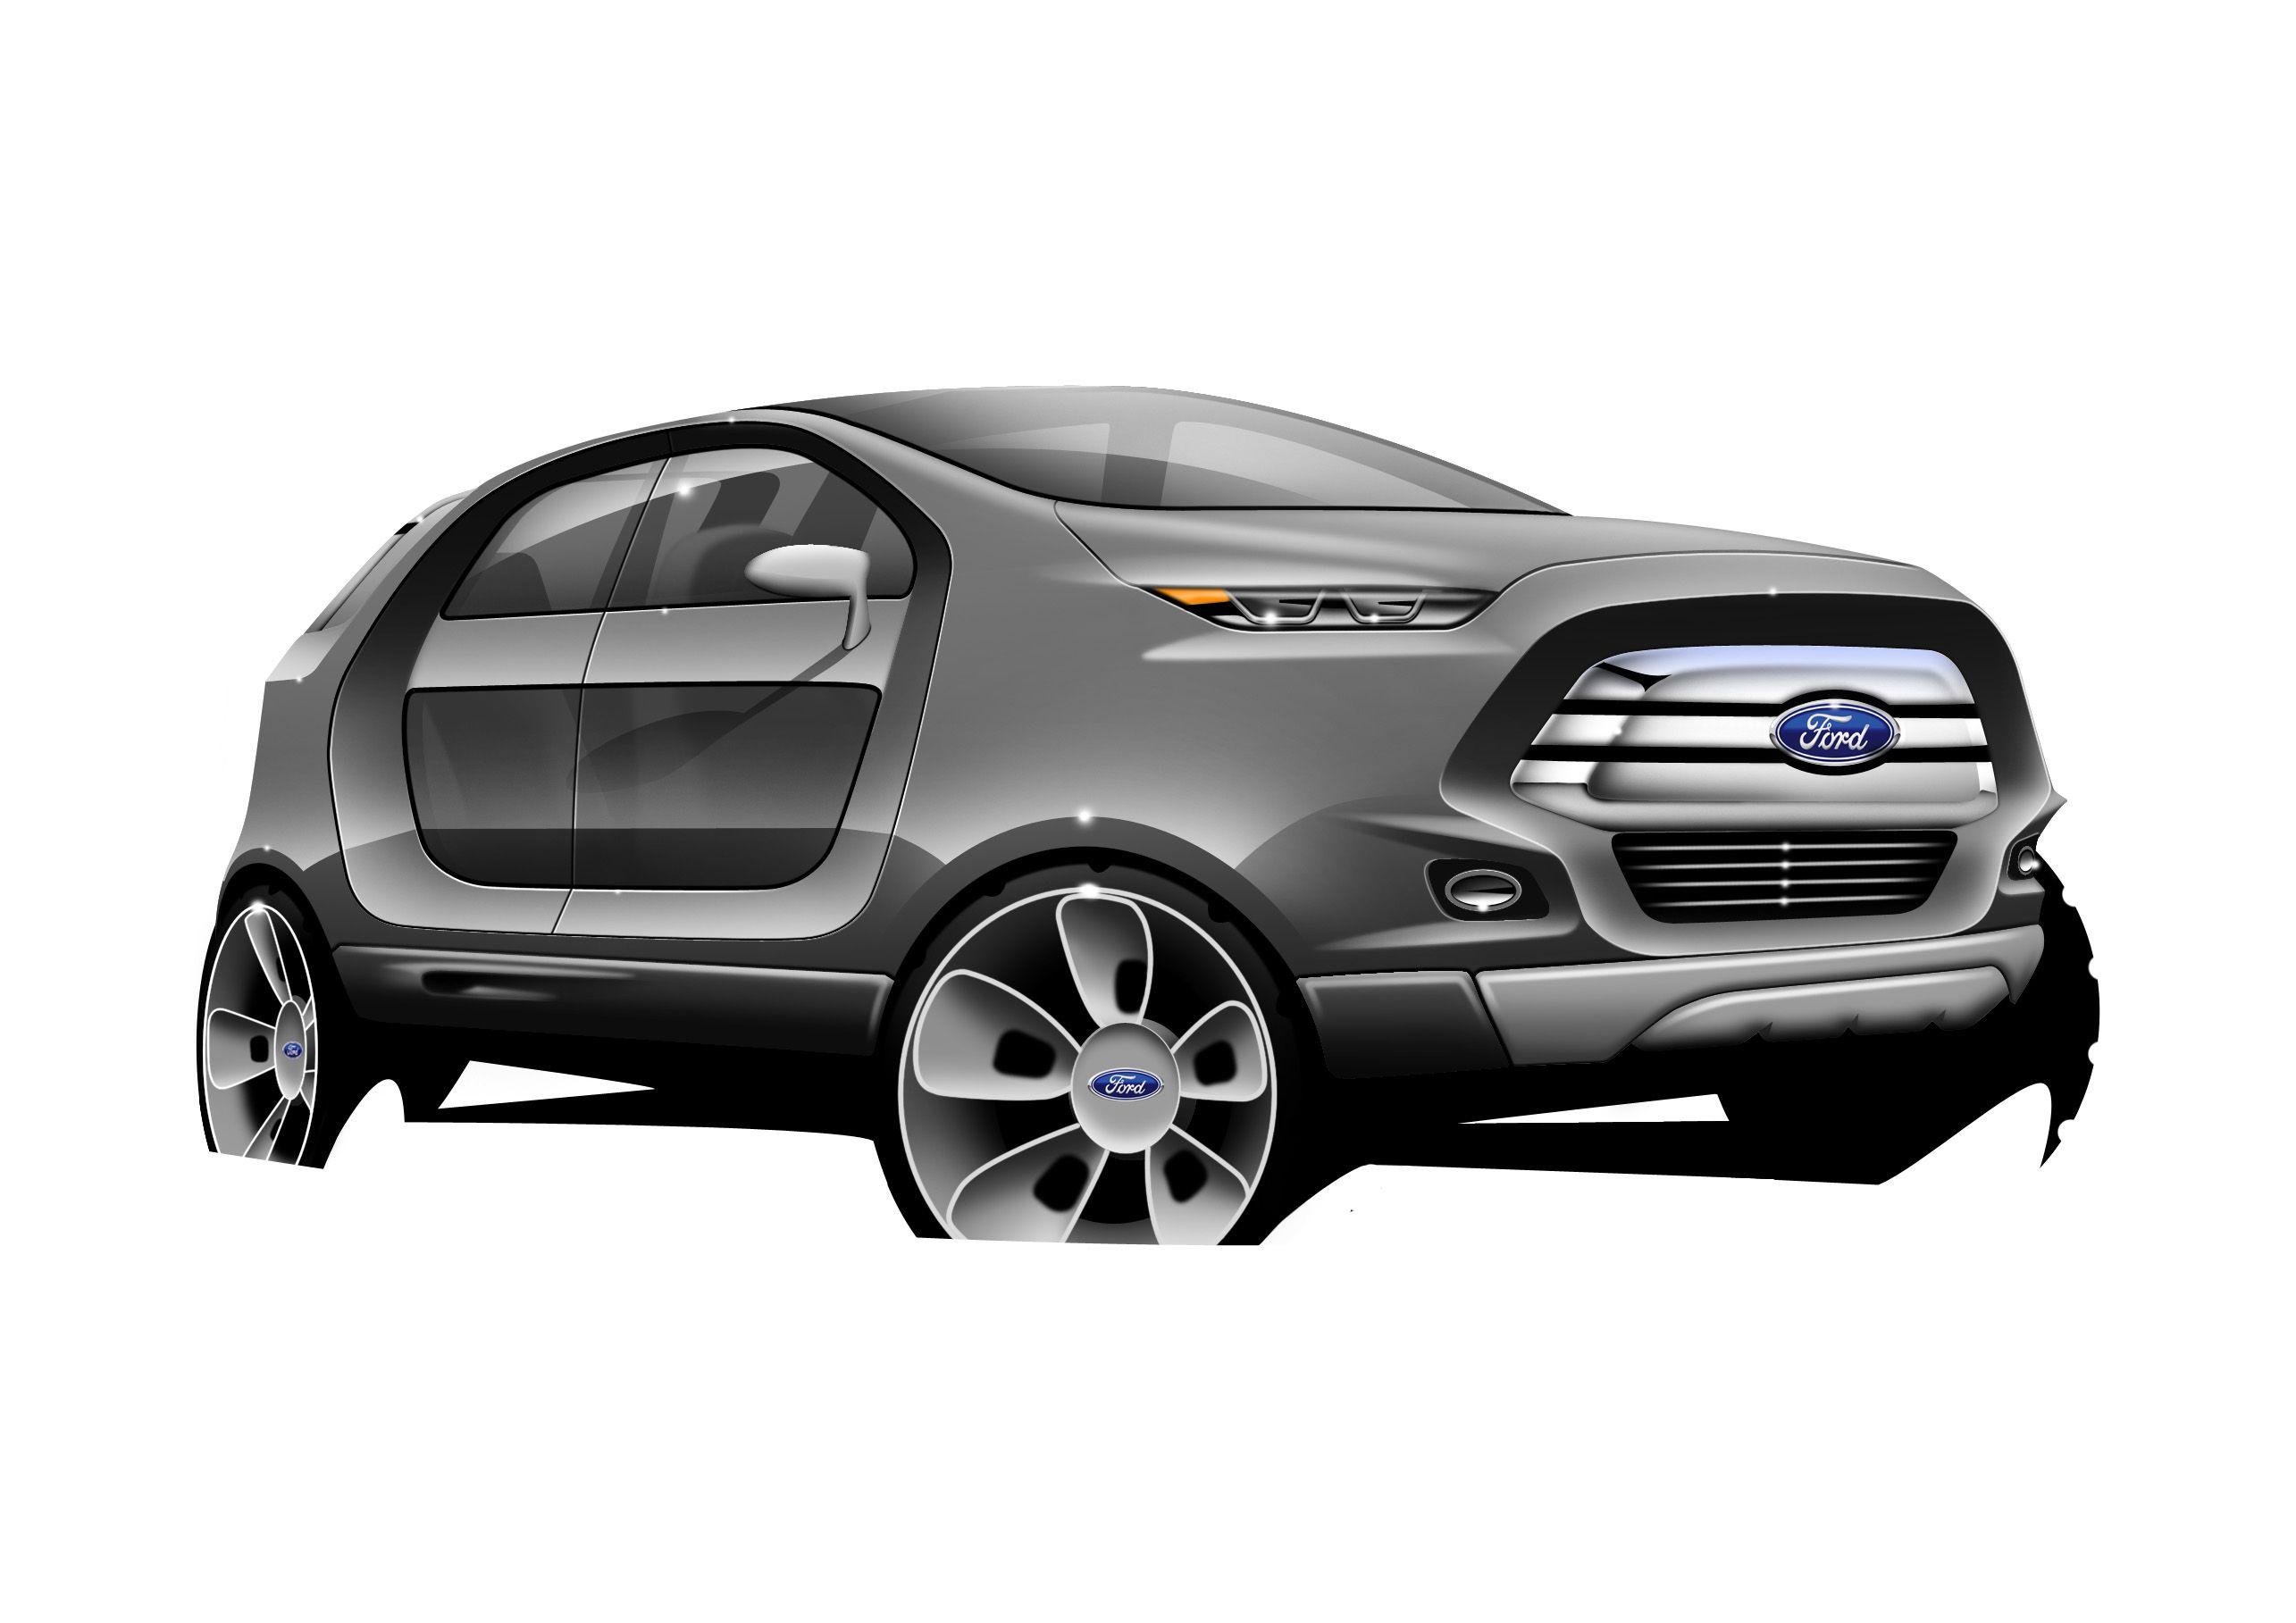 Render Digital Ford Ecosport 2022 Ford Ecosport Ford Dream Cars